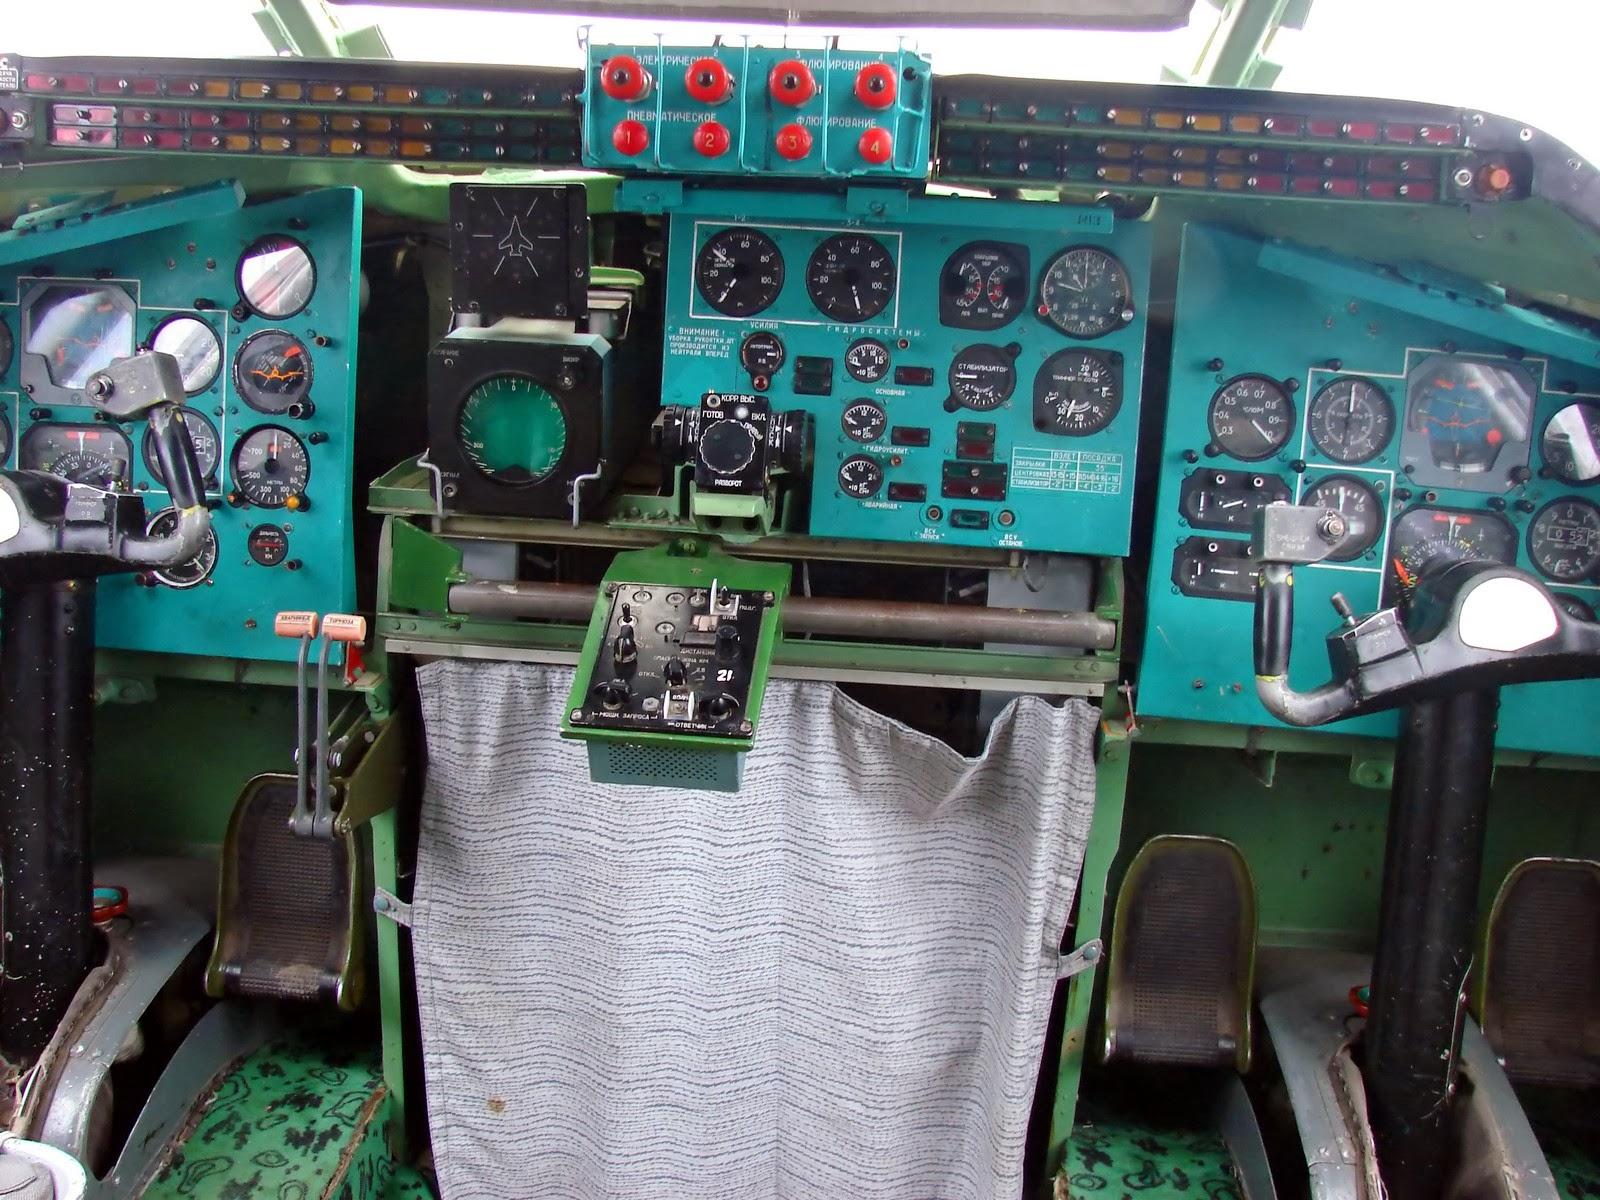 Кабина Ту-95: места пилотов